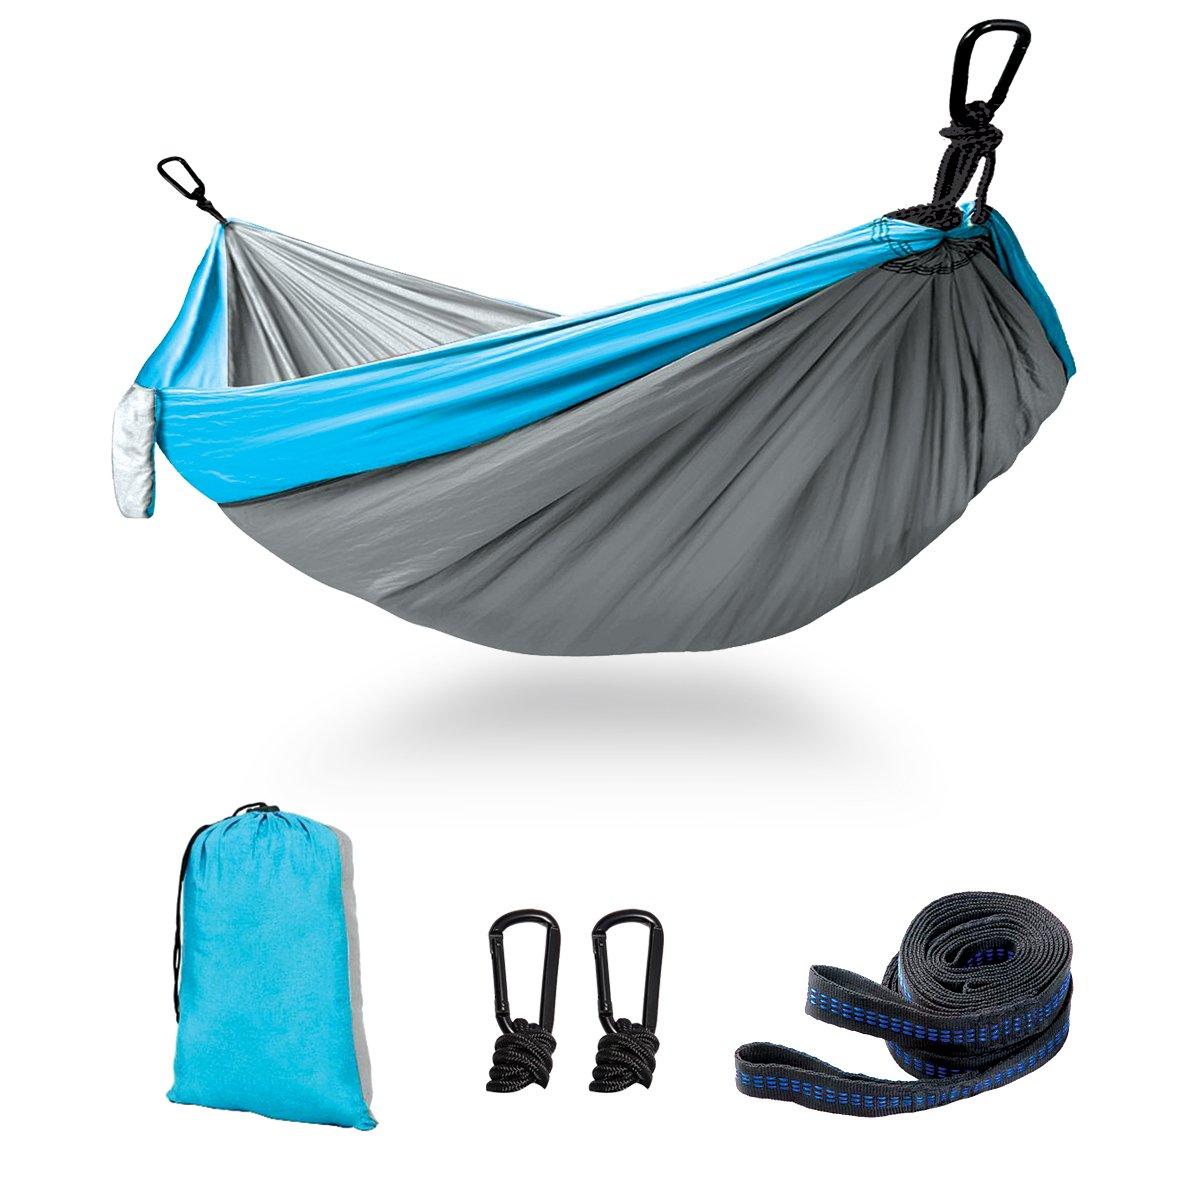 Kimfly Double Camping Hammock, Outdoor Portable Hammock 2 Adjustable Hanging Straps, Lightweight Parachute Nylon Hammock Backpacking, Hiking, Beach, Yard, Traveling